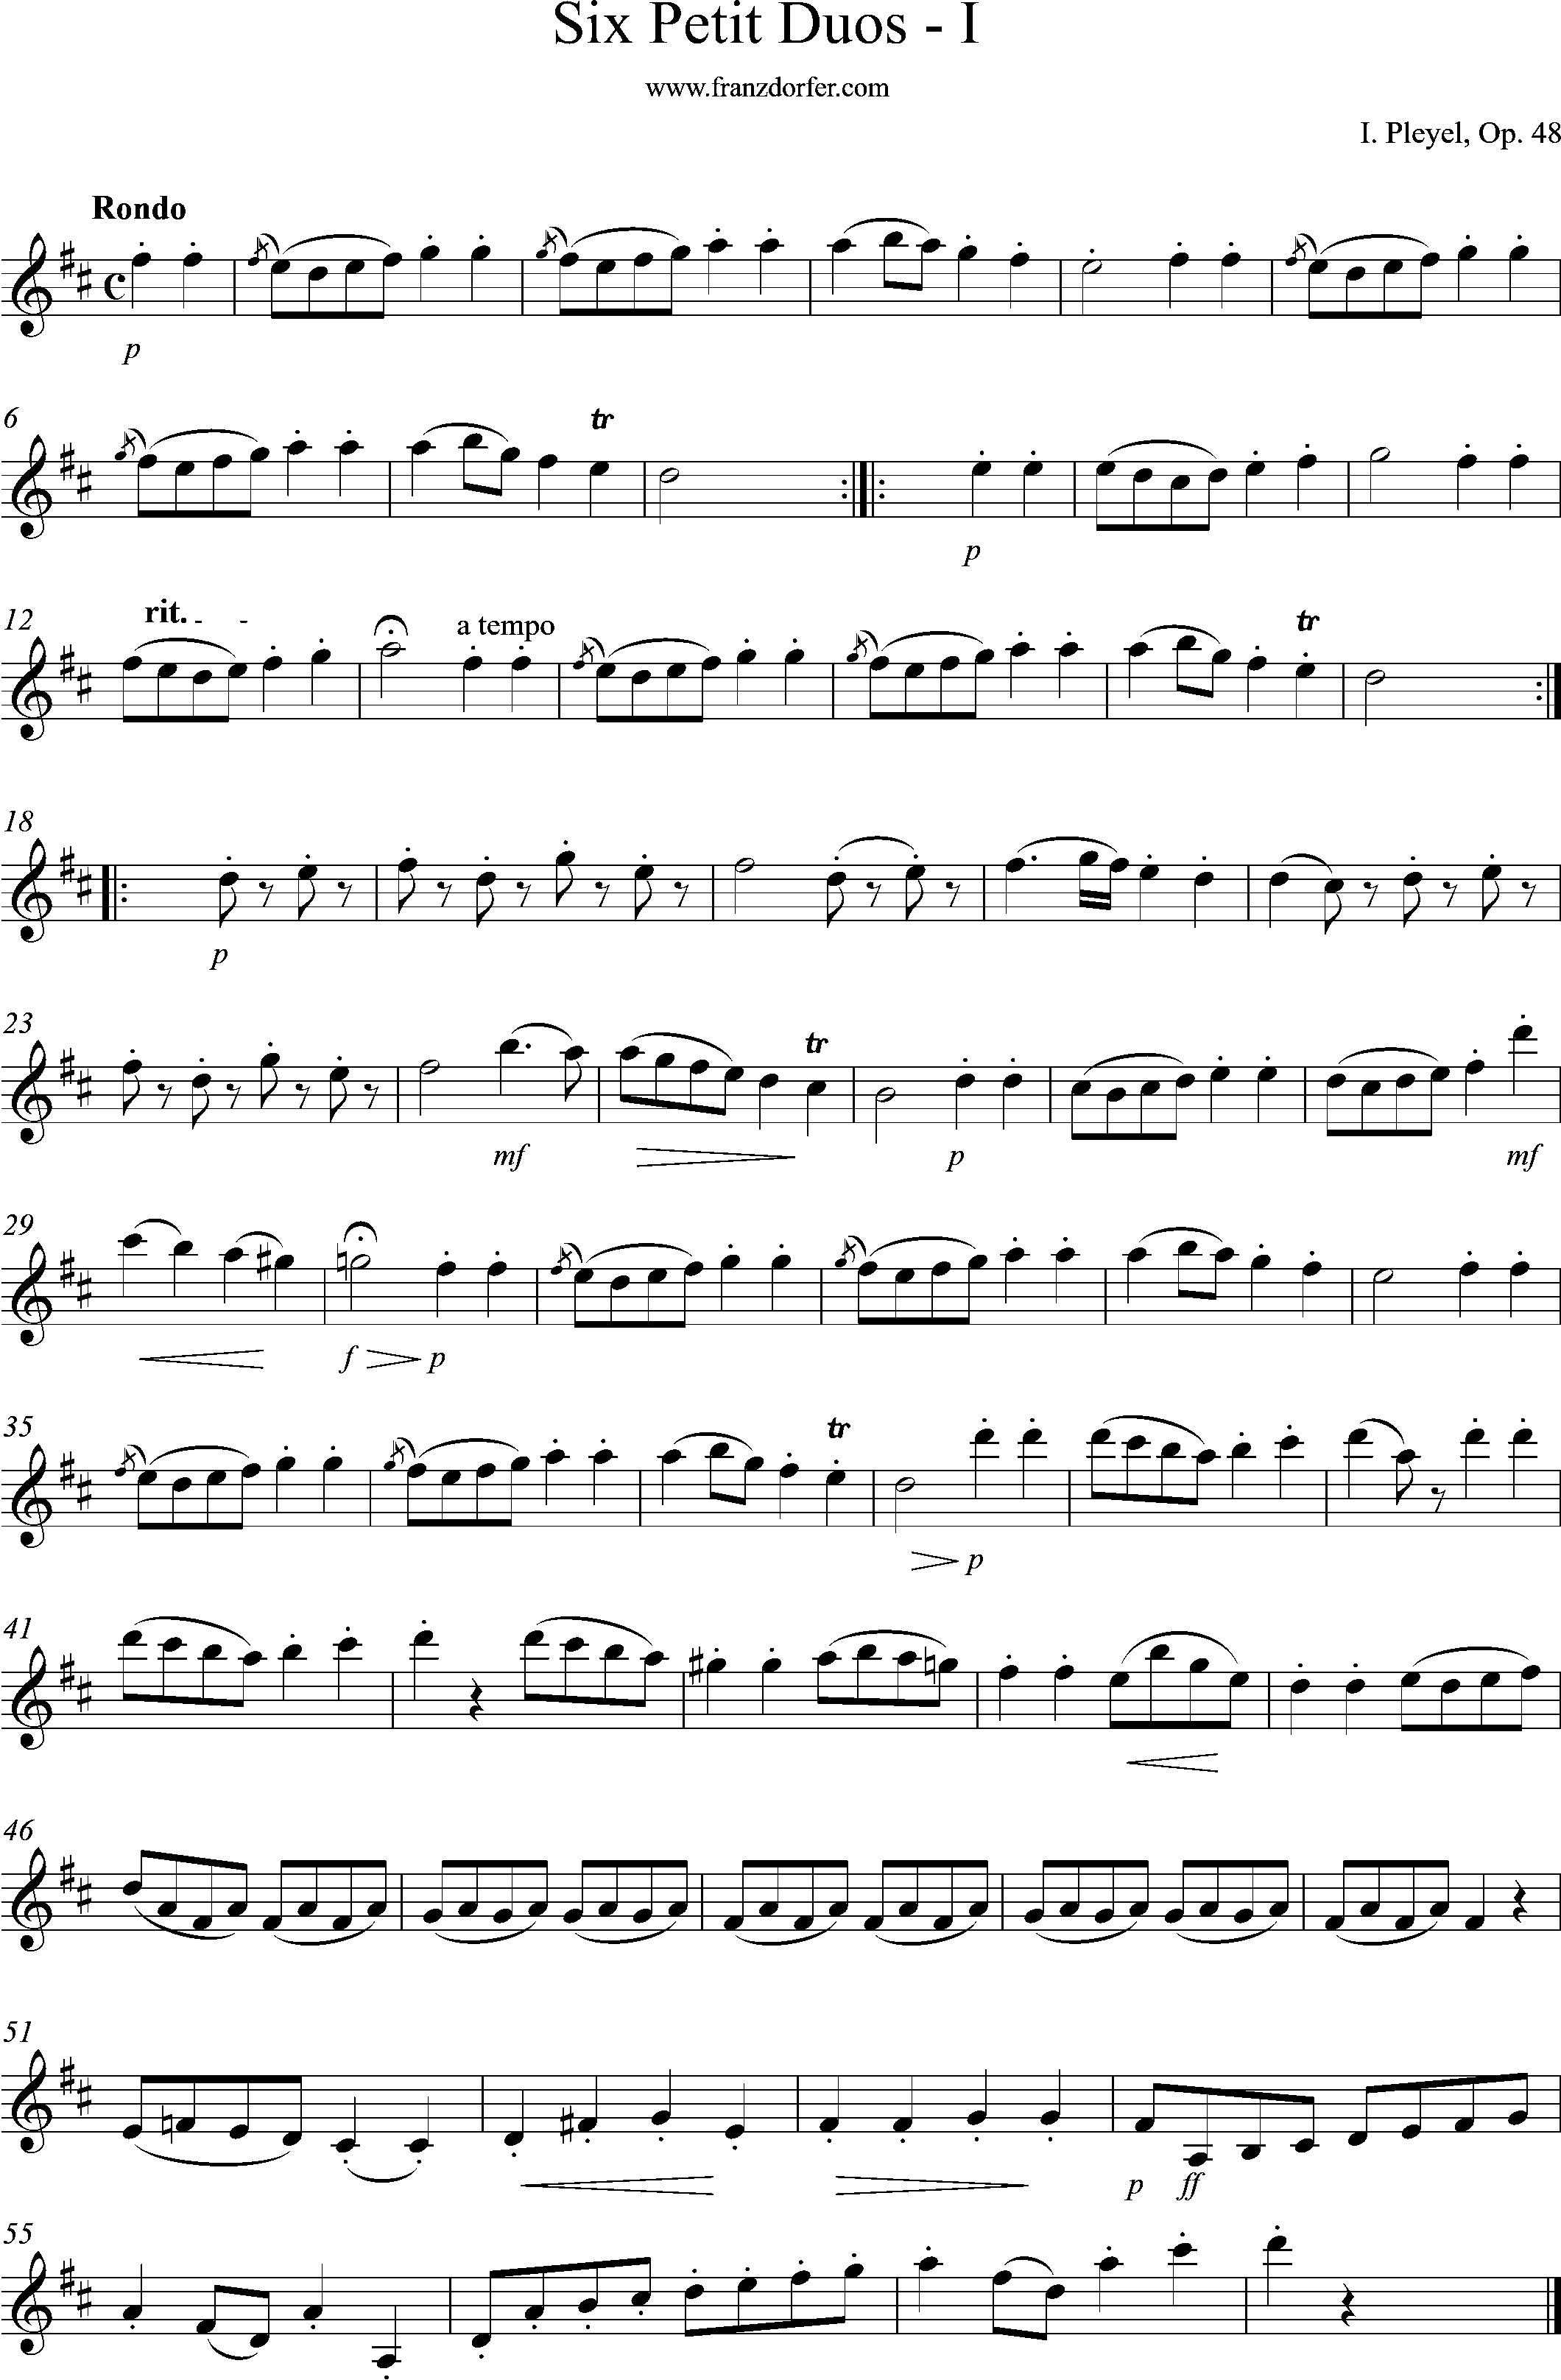 clarinet sheetmusic plexel op48, Rondo